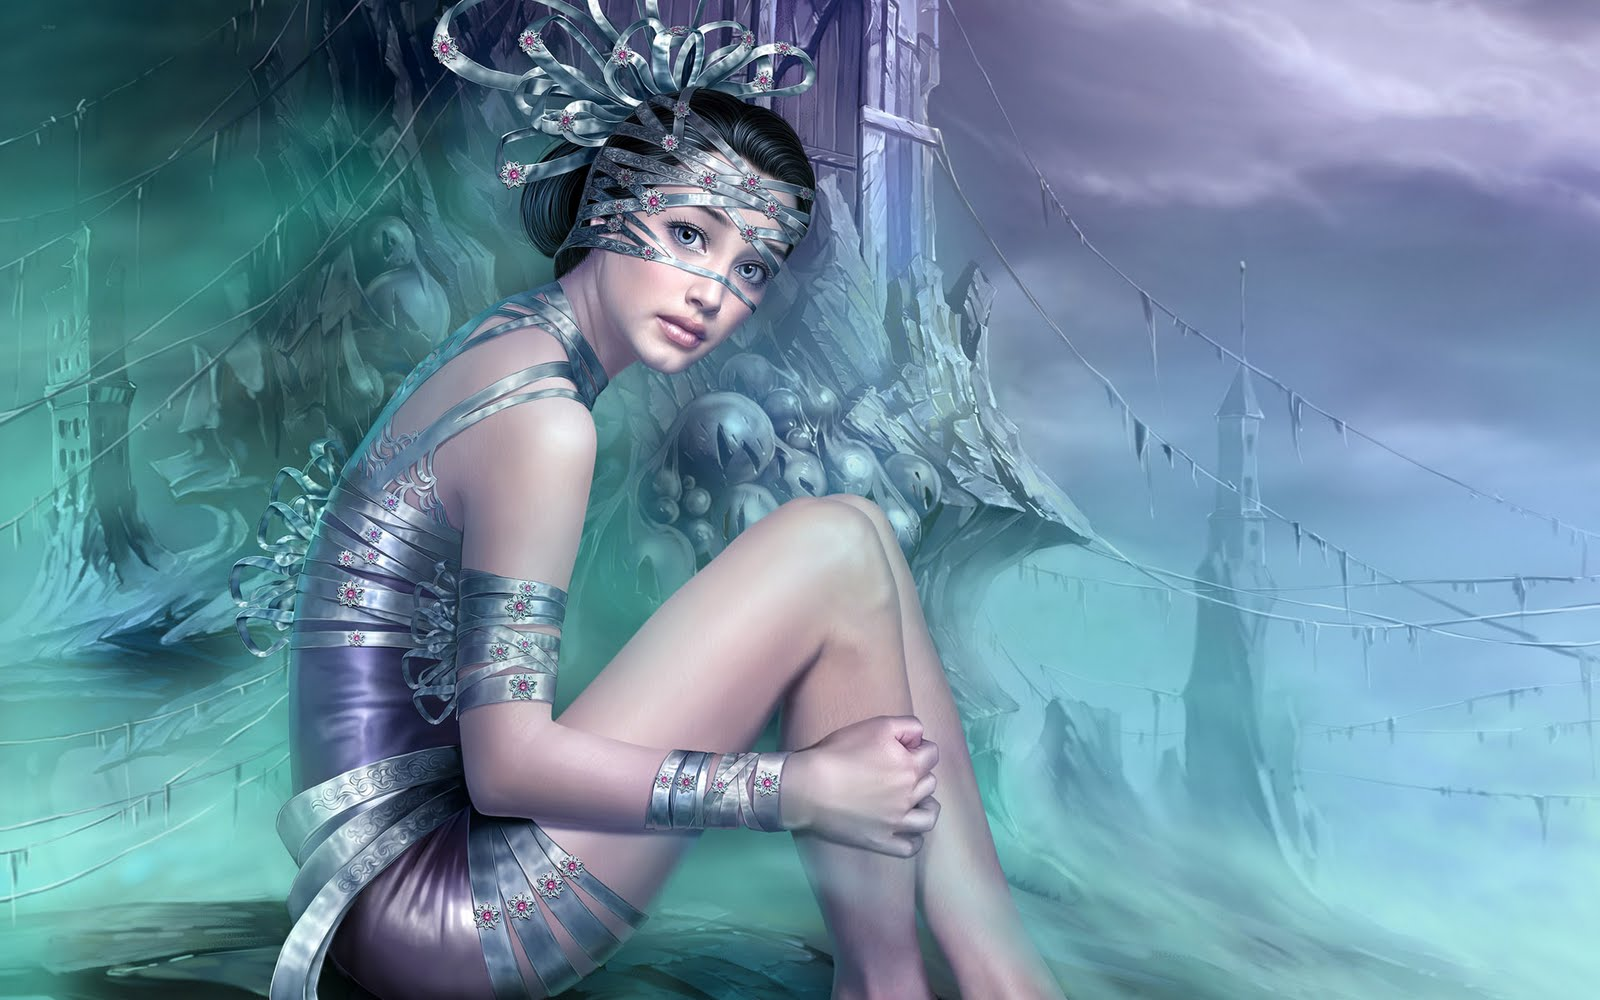 Fantasy girl Pc desktop HD paintingswallpaper 1440x900 and 1920x1200 1600x1000